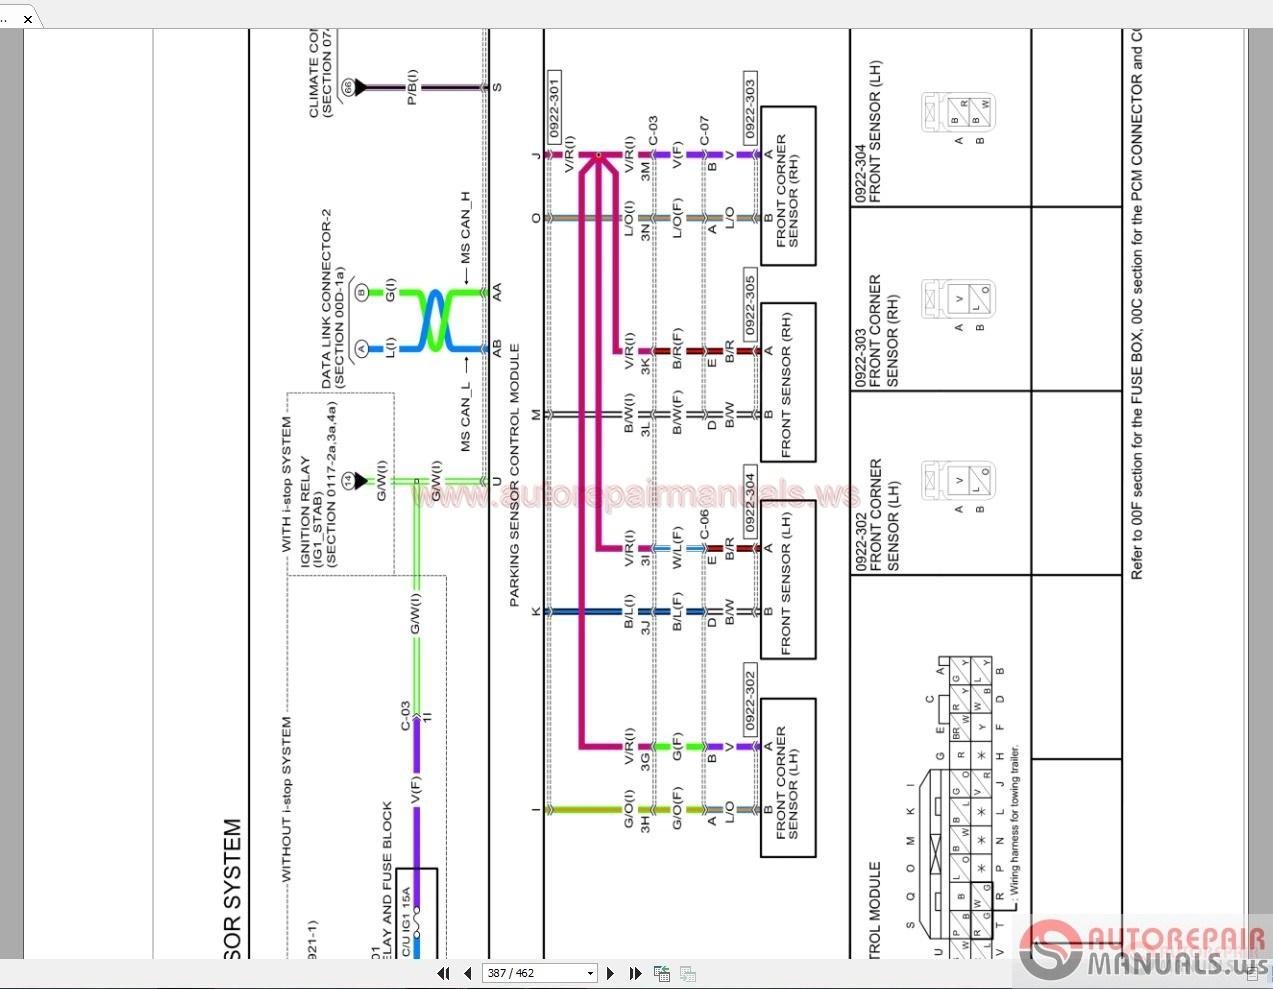 [SCHEMATICS_4CA]  NZ_2391] Opel Kadett 200Is Wiring Diagram Schematic Wiring | Opel Kadett 200is Wiring Diagram |  | Llonu Umng Amenti Scata Mecad Favo Mohammedshrine Librar Wiring 101